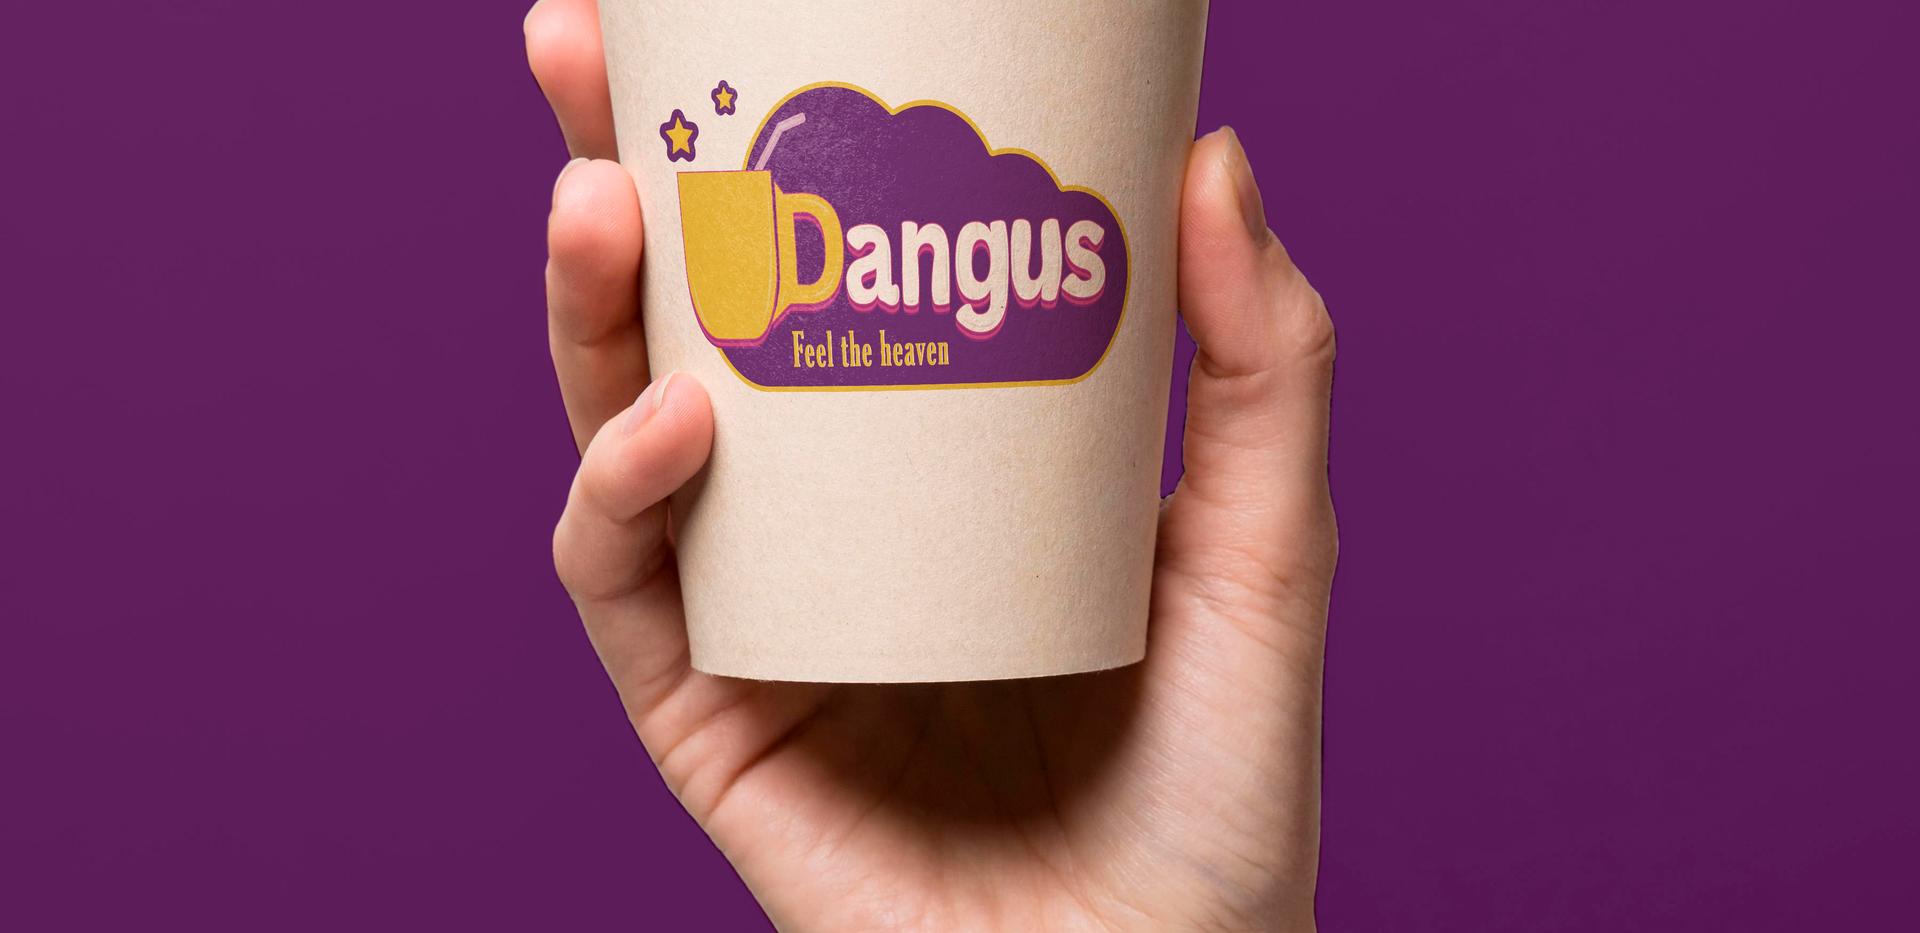 dangus purple.png